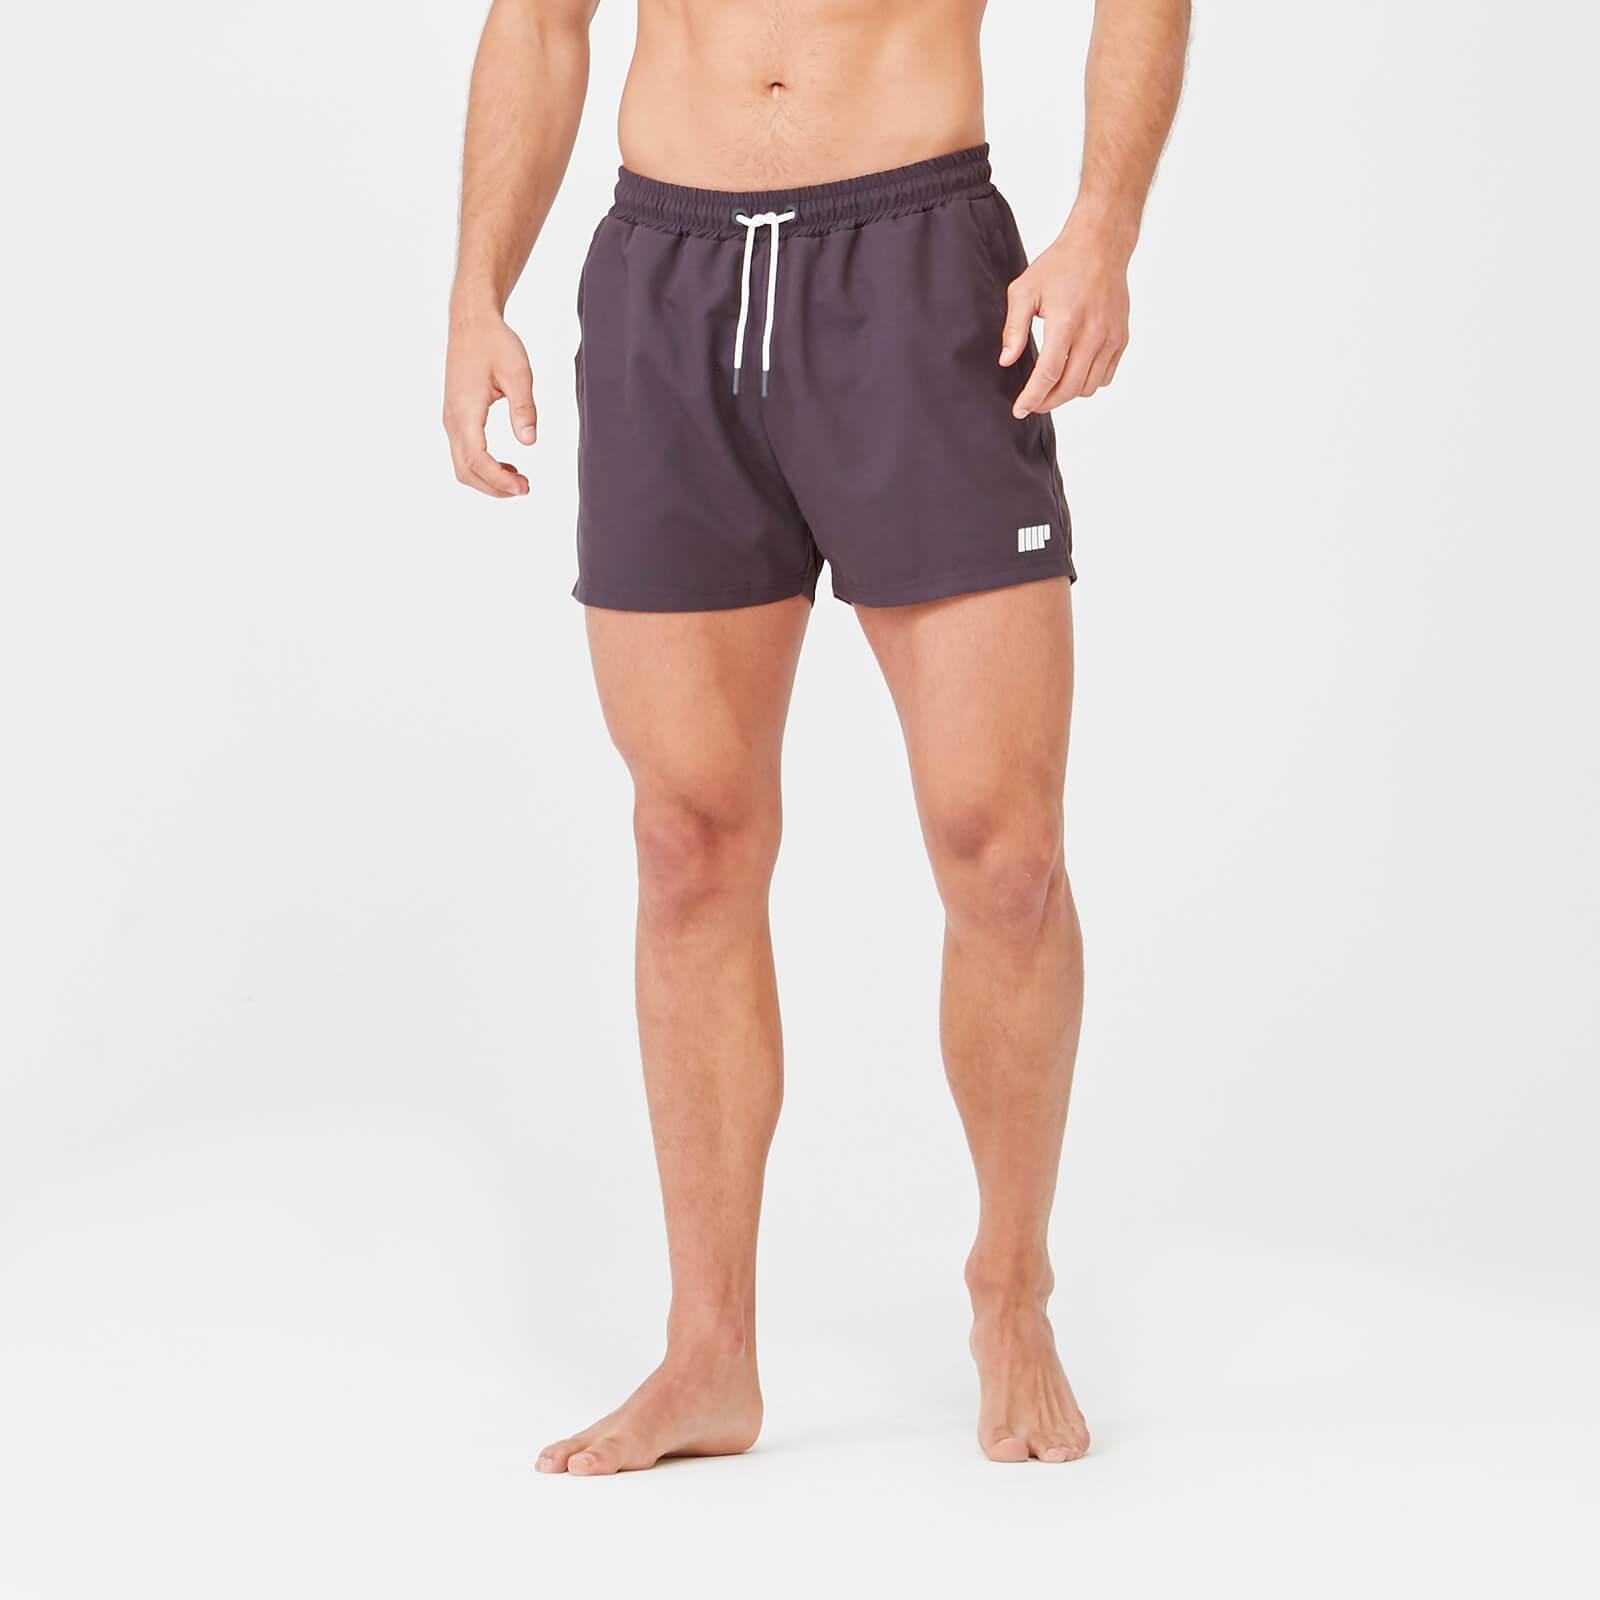 Myprotein Costume a Pantaloncino Marina - S - Slate